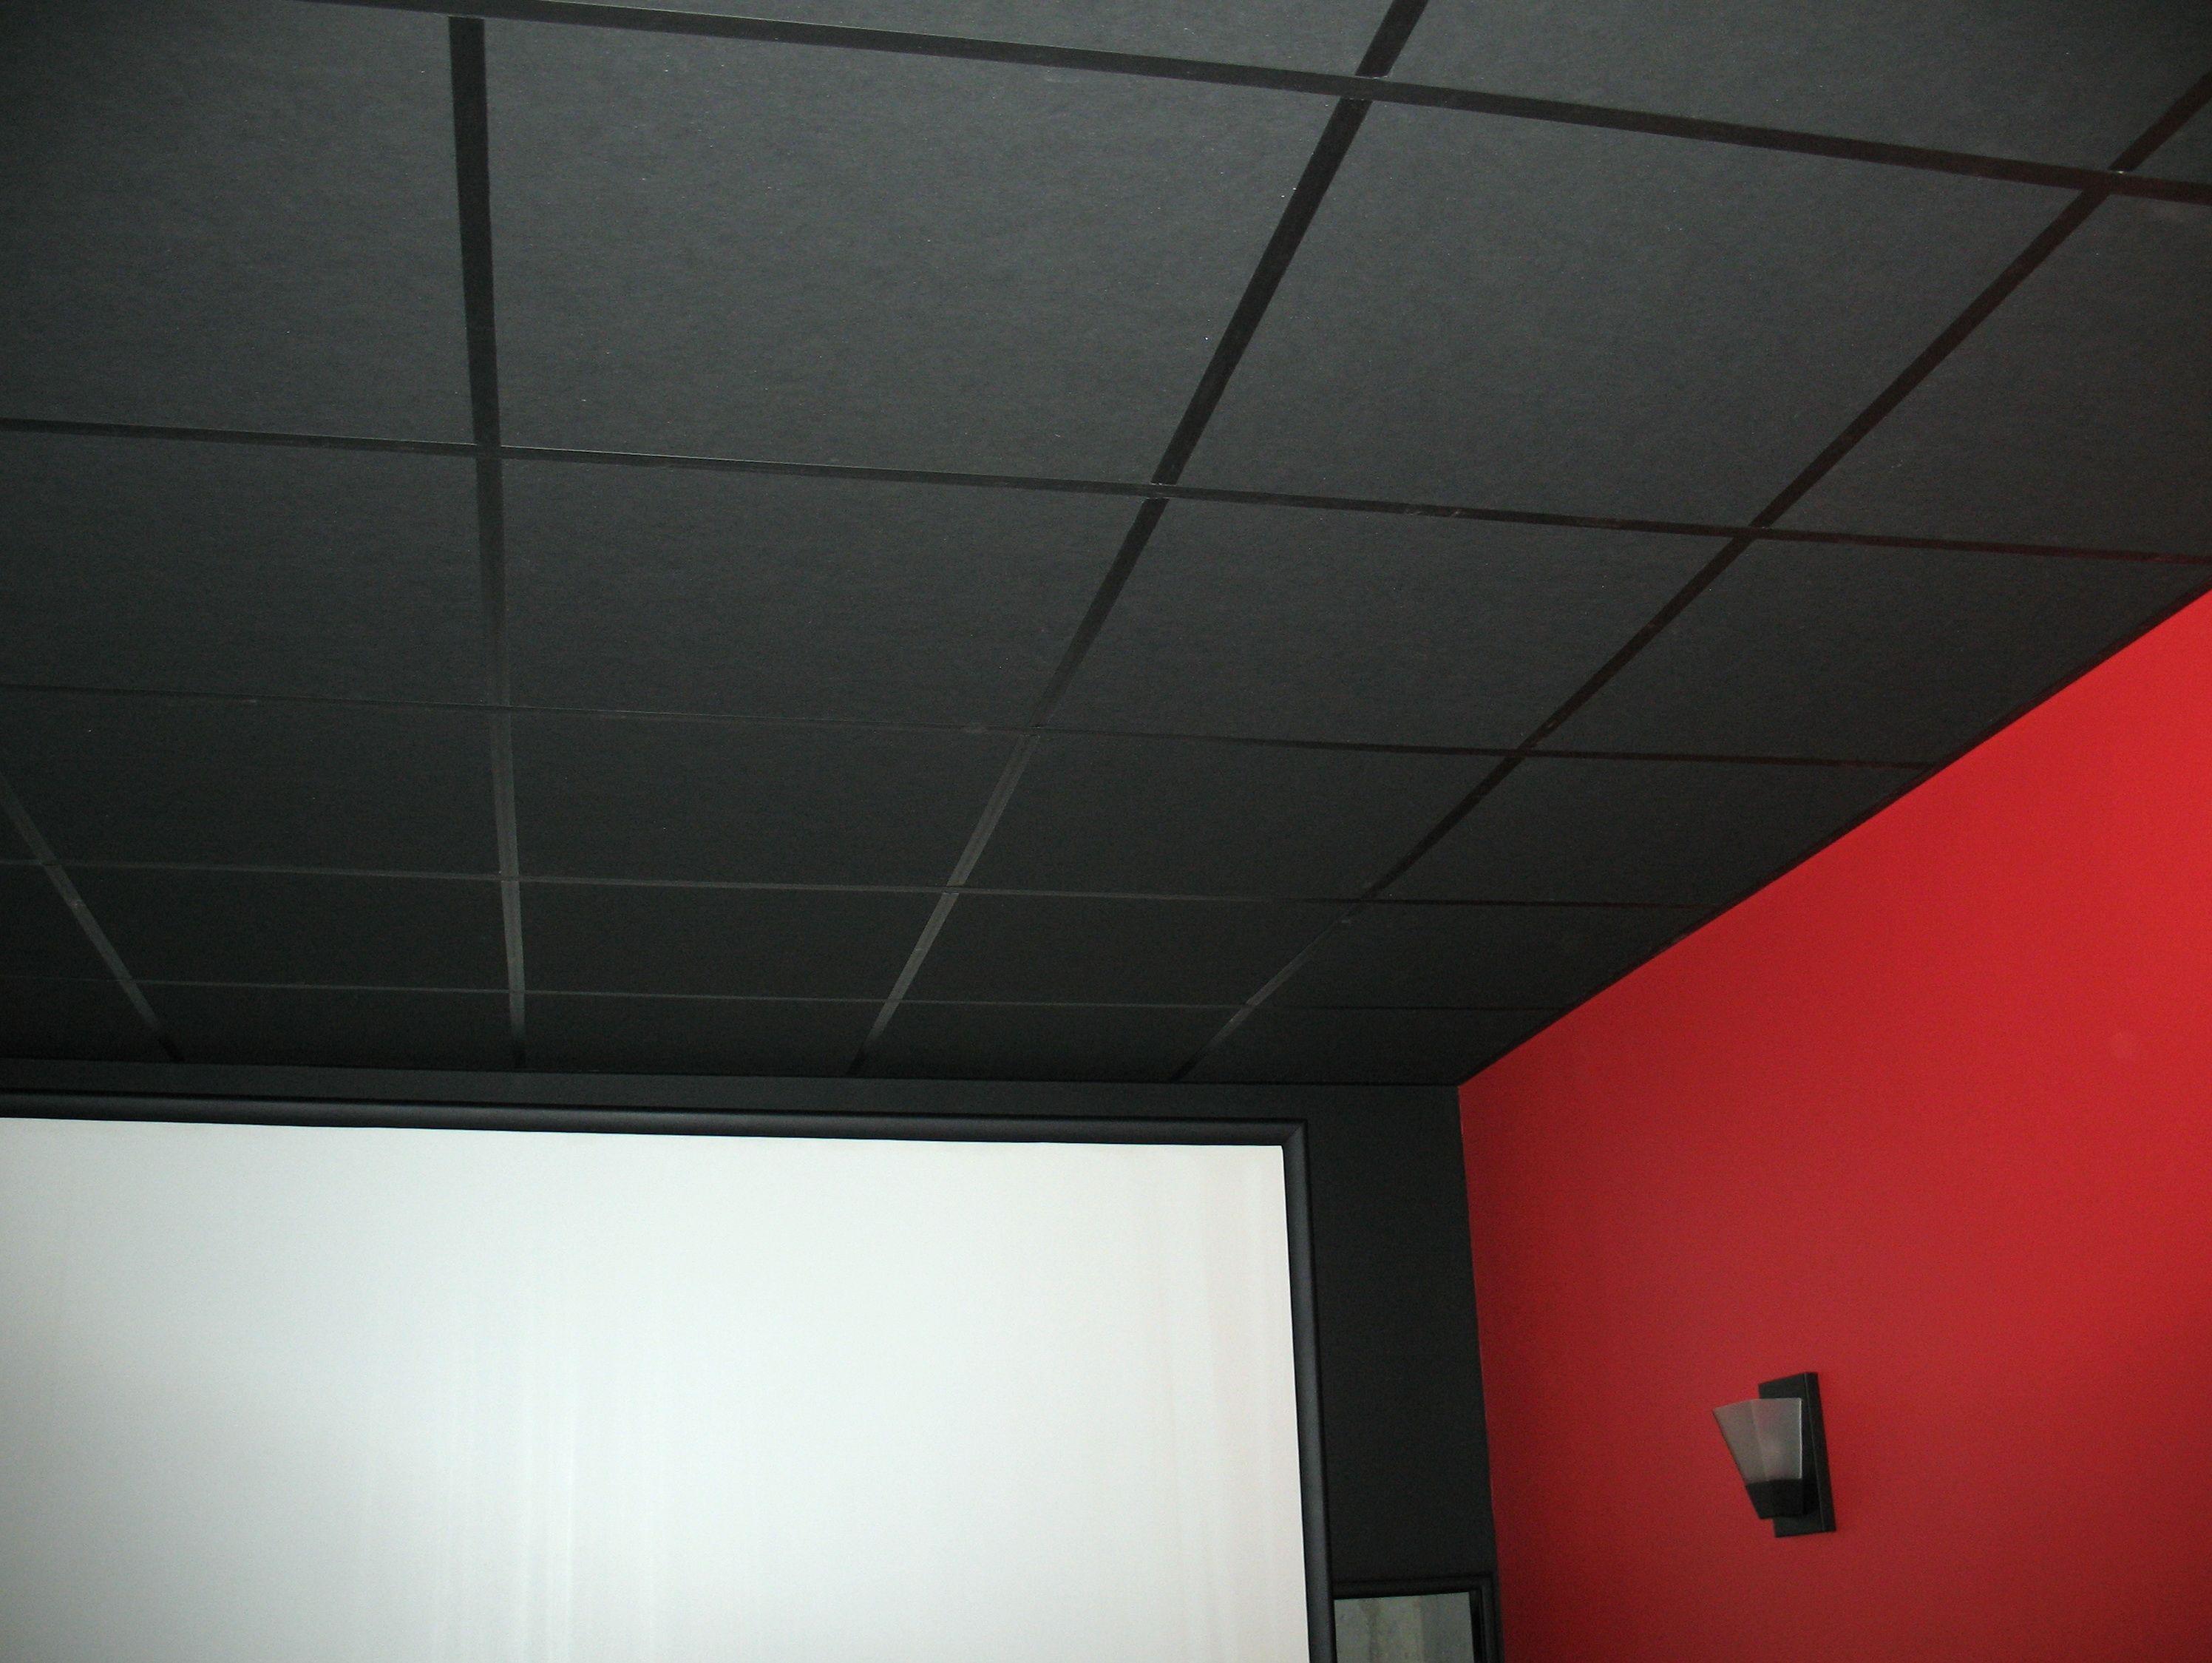 Pretty 12X12 Cork Floor Tiles Tiny 2X2 Floor Tile Regular 3X6 Subway Tile White 8X8 Ceramic Floor Tile Youthful Acoustical Ceiling Tile Manufacturers BrownAluminum Ceiling Tiles Creativechairsandtables.com ..